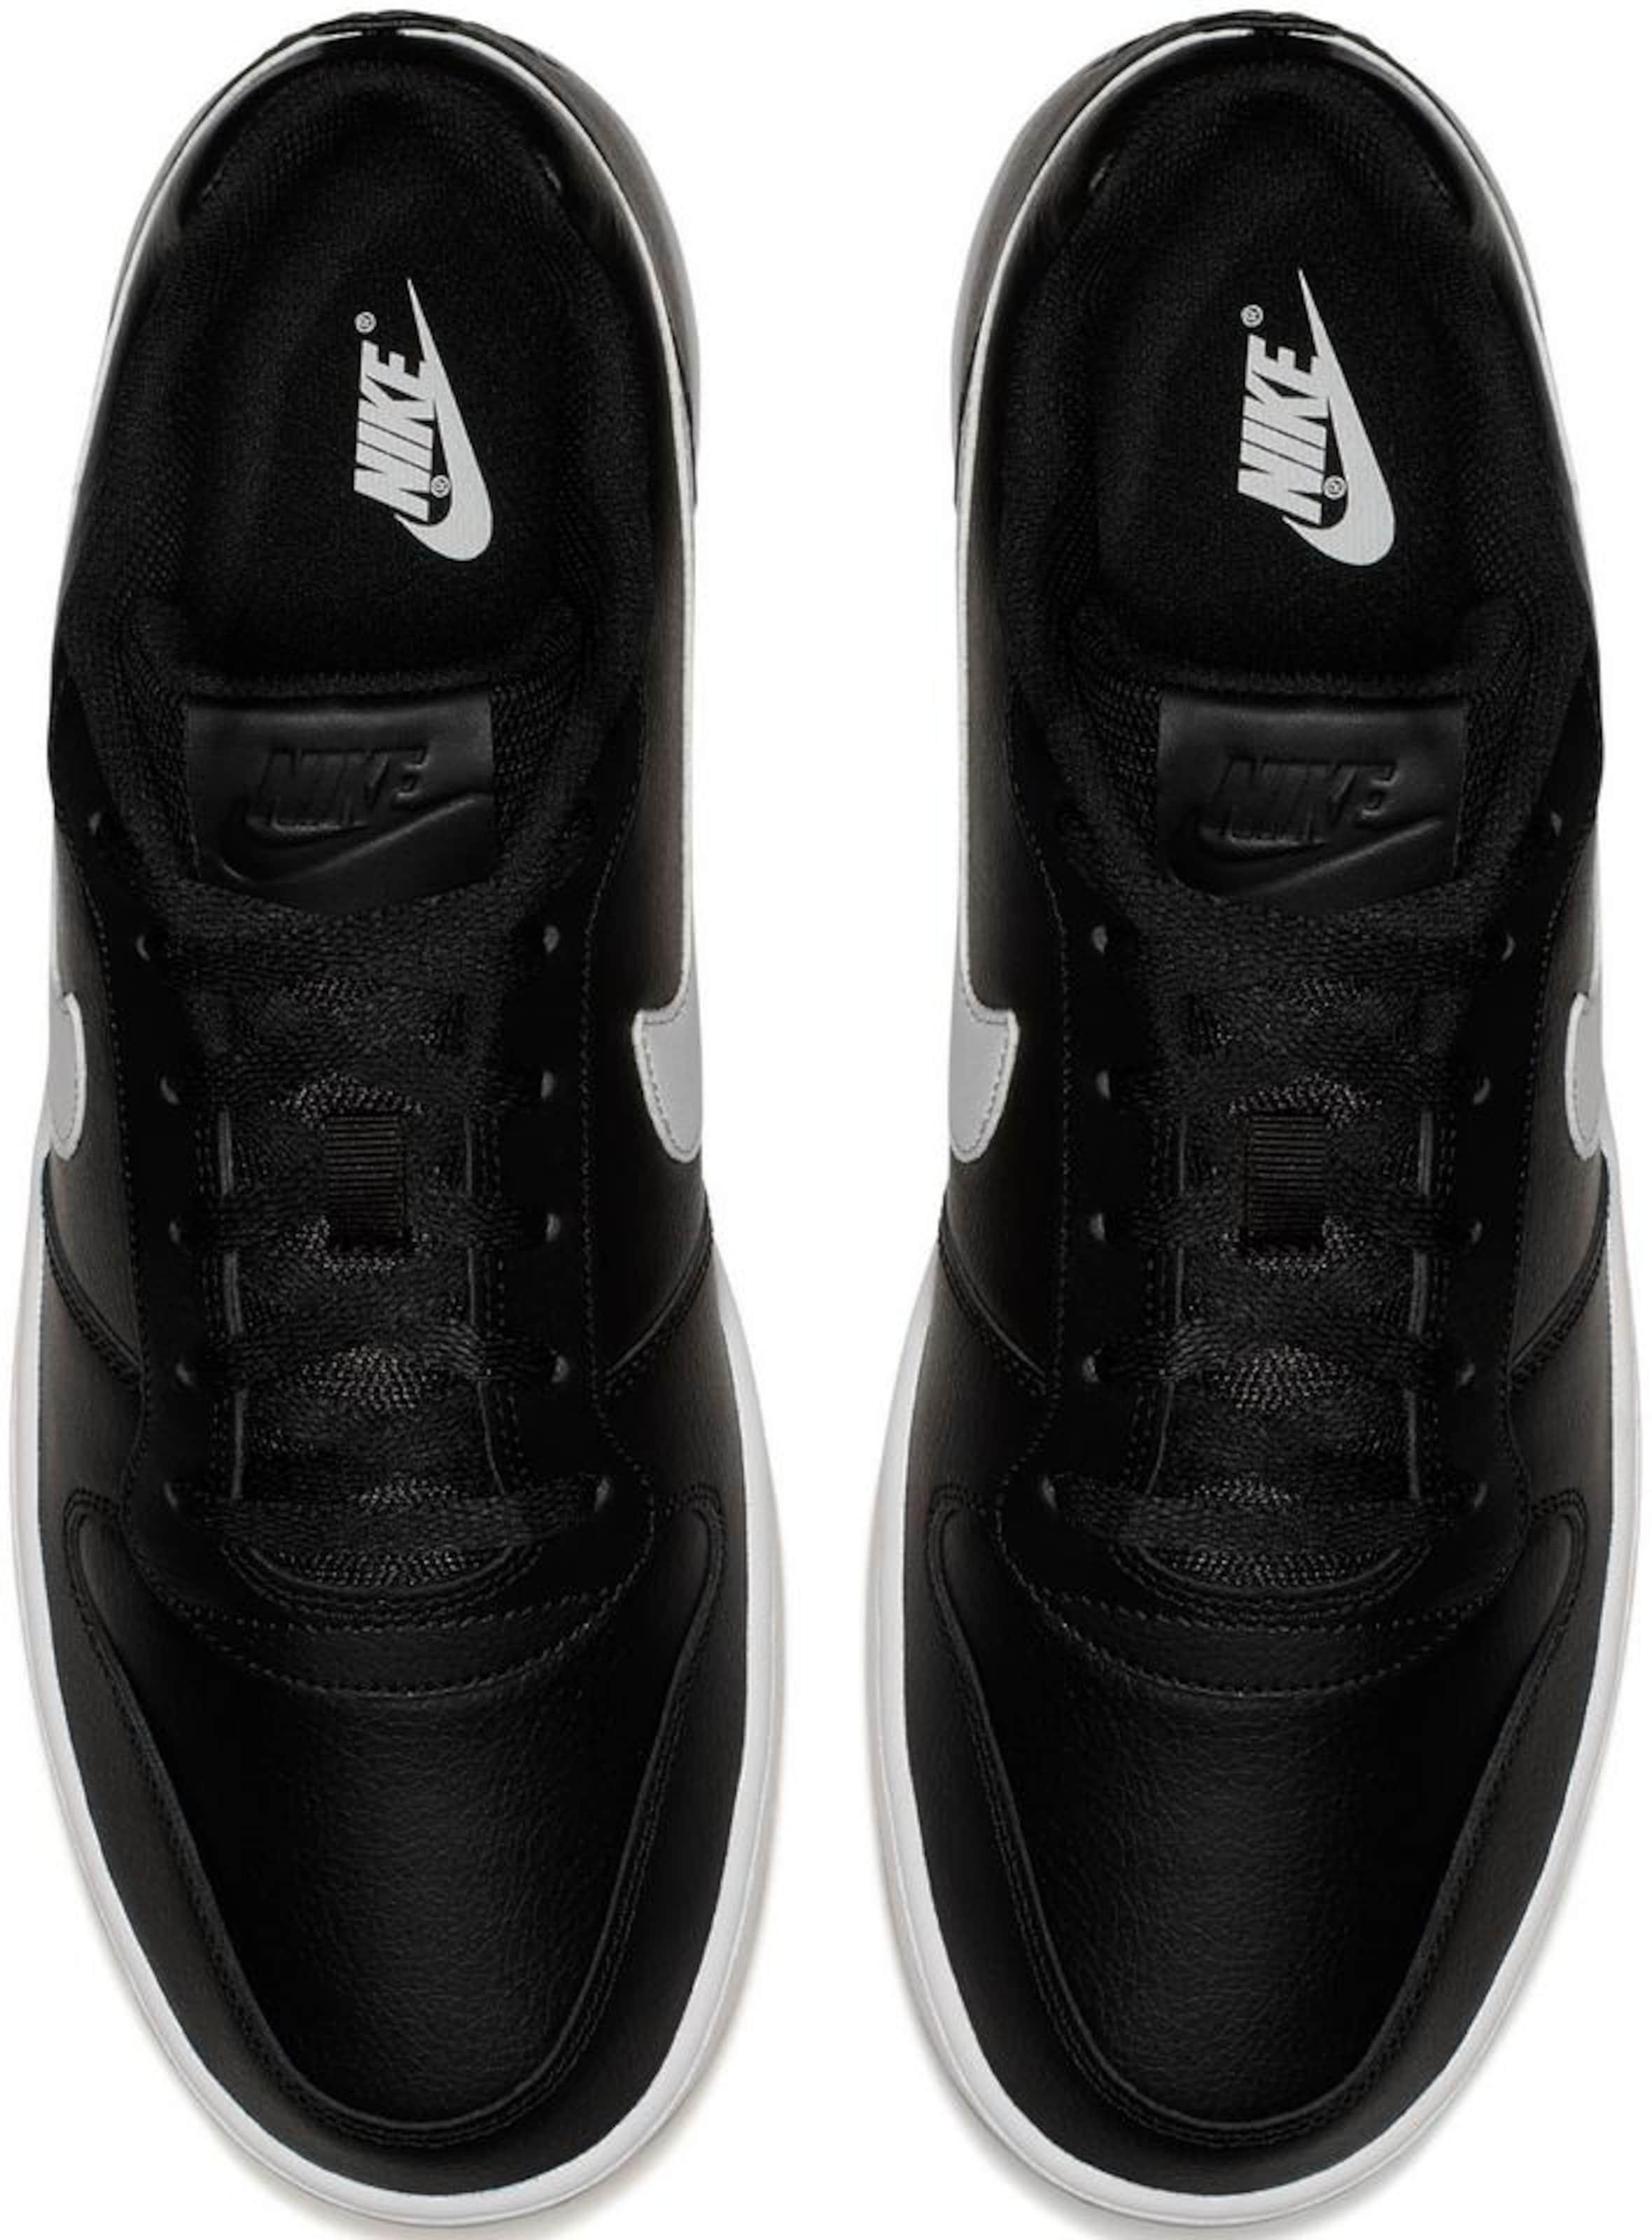 In SchwarzWeiß Sportswear Sneakers 'ebernon' Nike SzqVGpUM